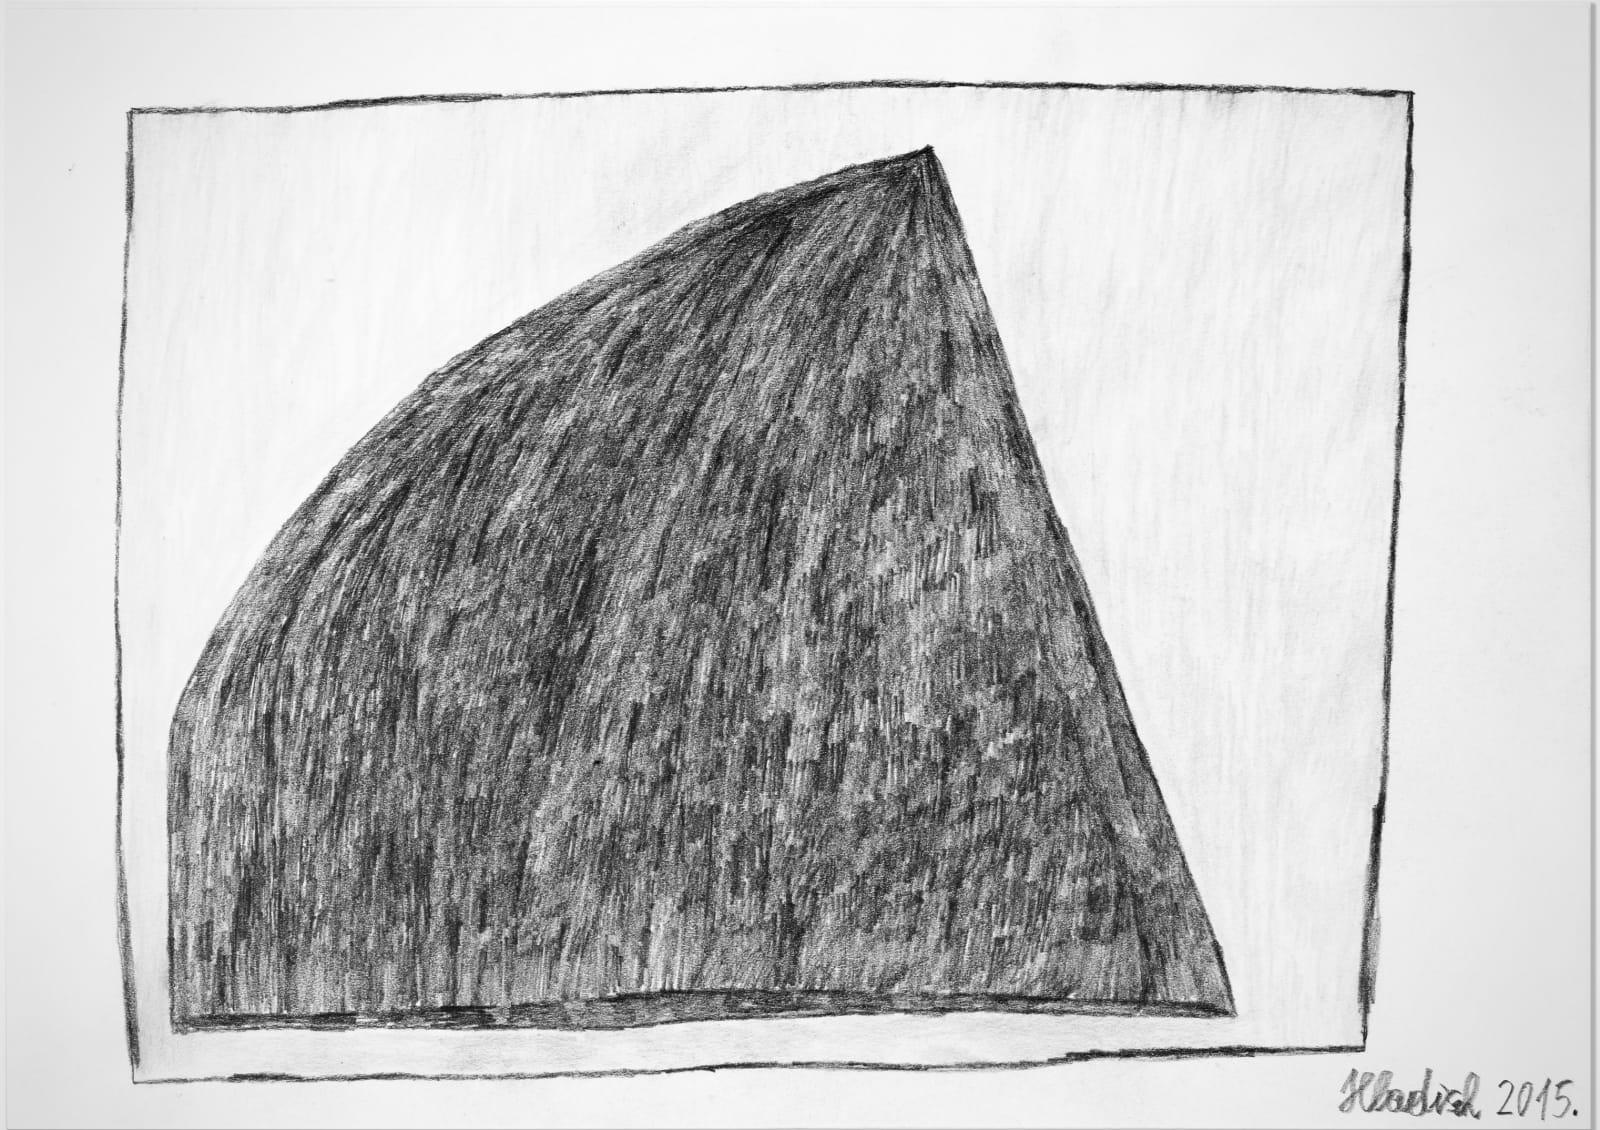 Pyramid, 2015 Graphite and colored pencil on paper 8.2 x 11.7 in. (20.9 x 29.6 cm.) (HH 18) $3,000